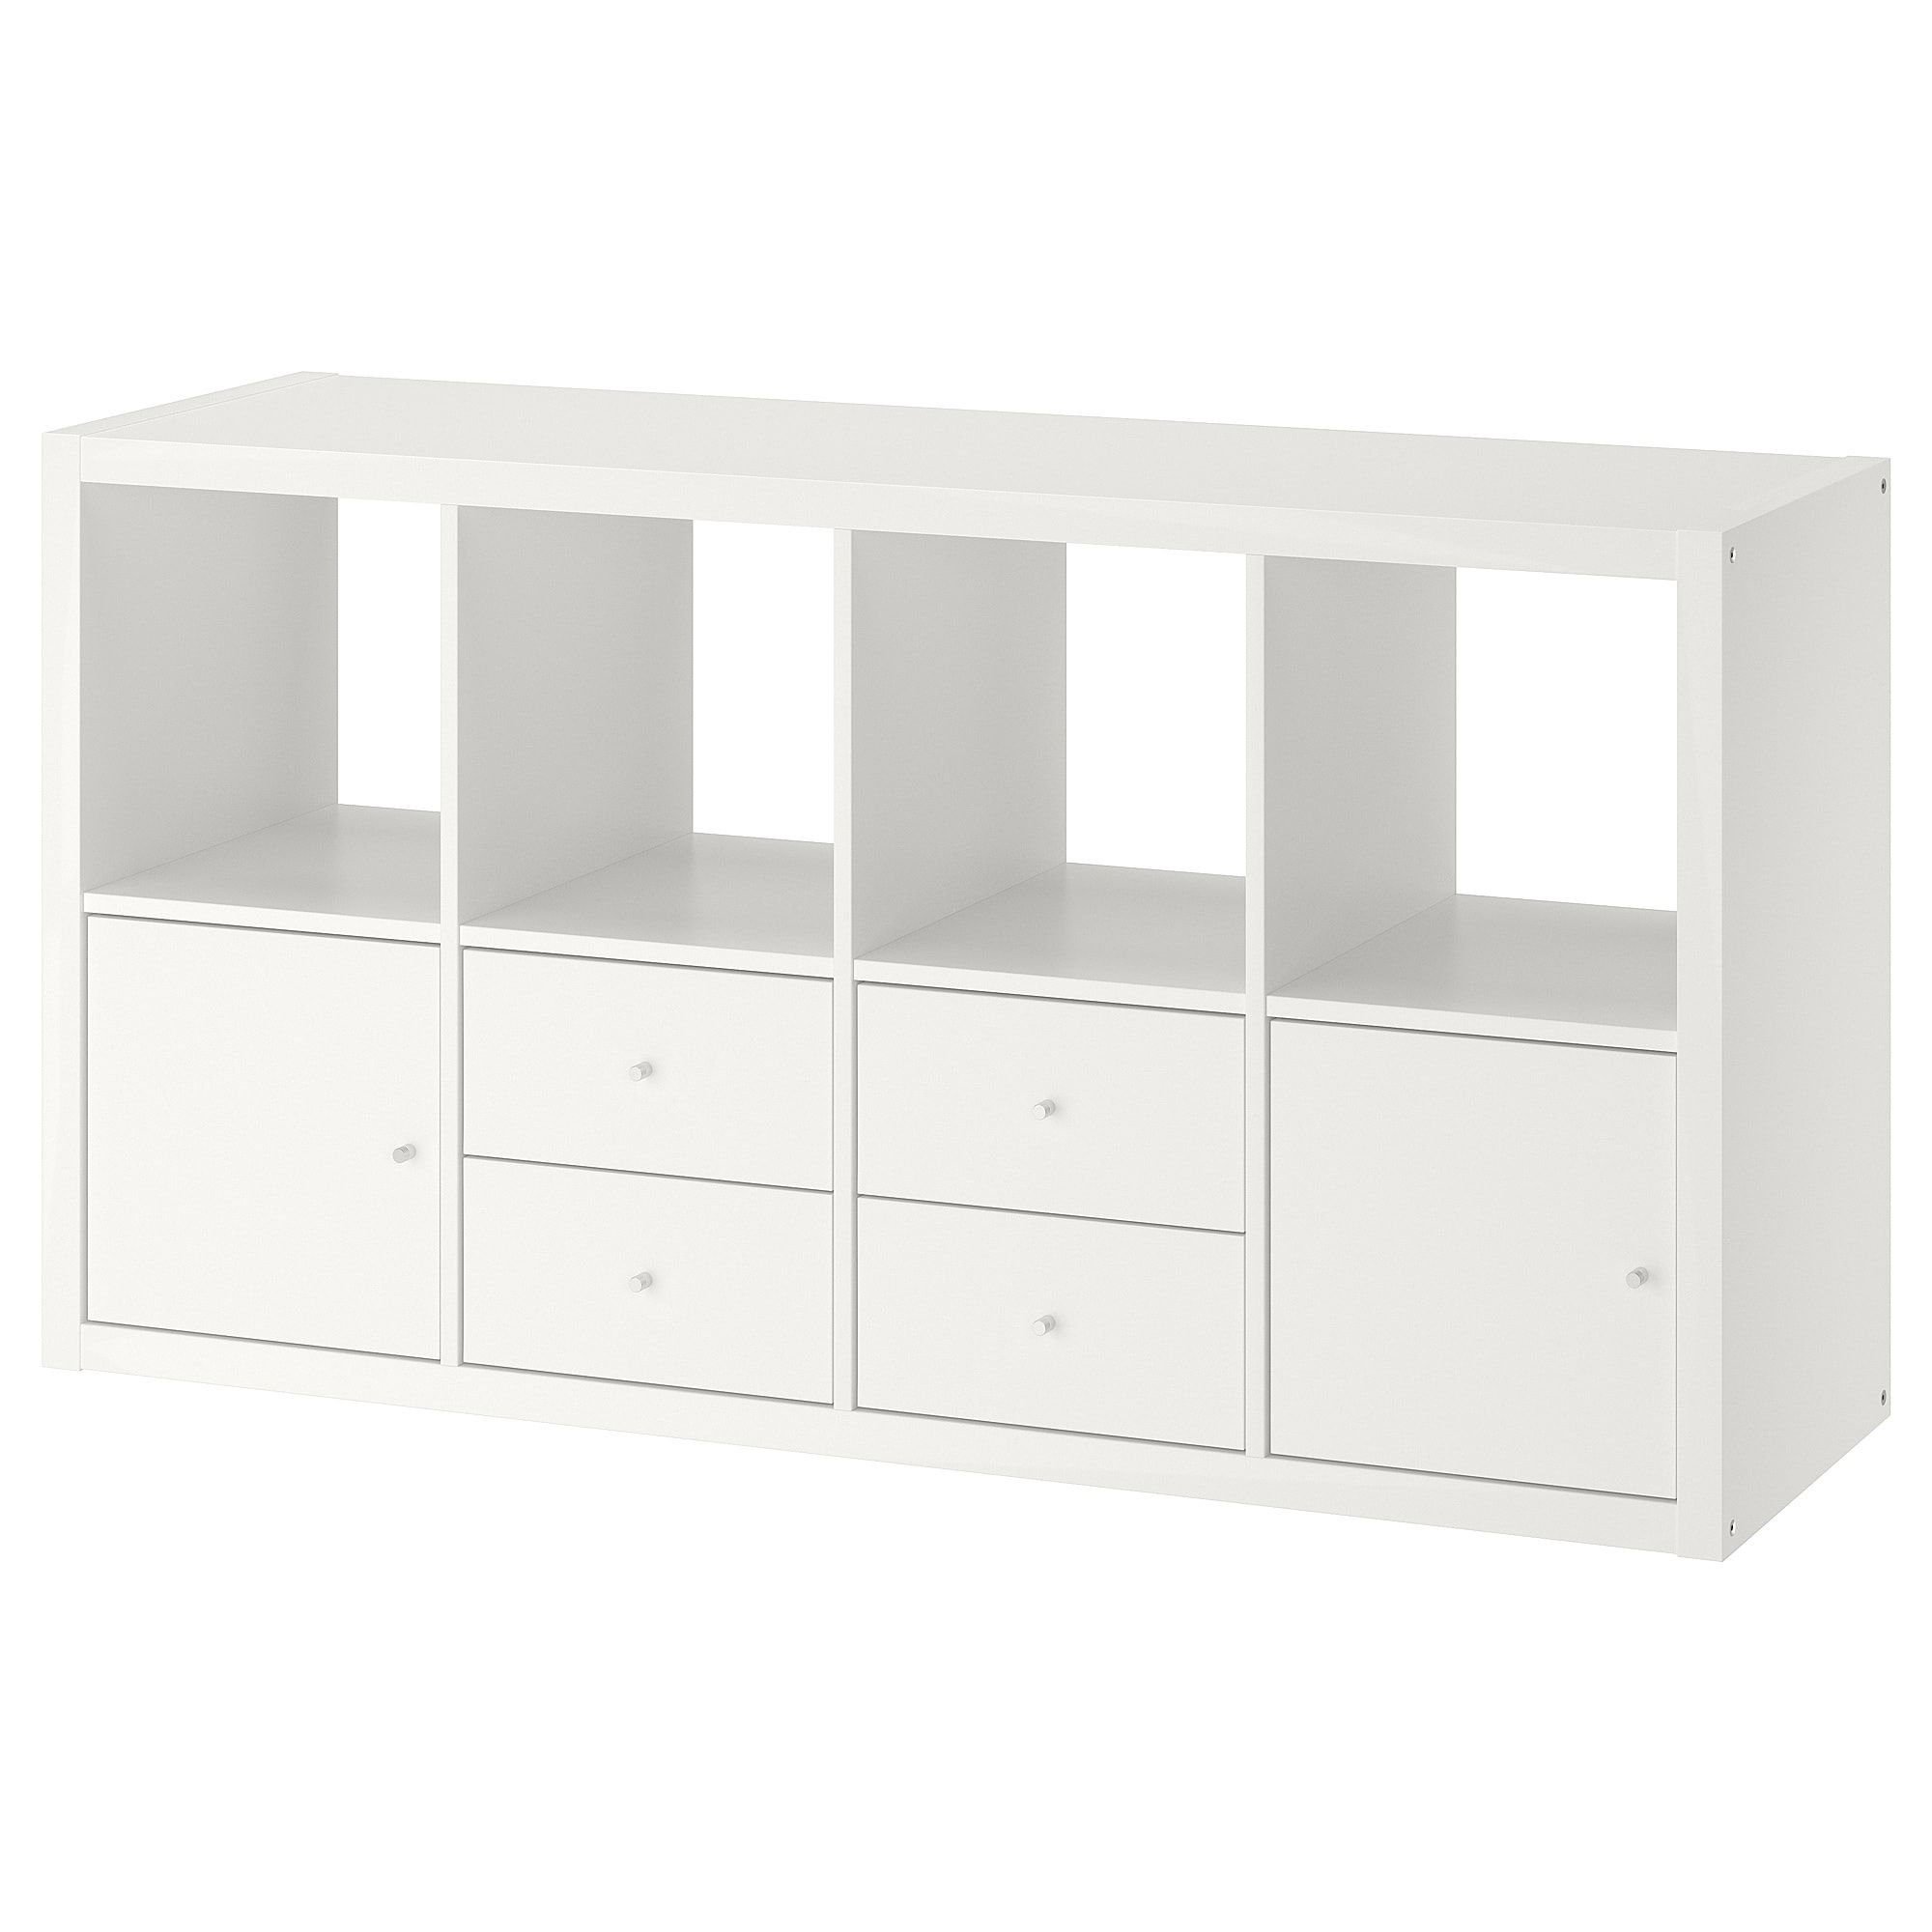 KALLAX Shelf unit with 4 inserts white 30 38x57 78